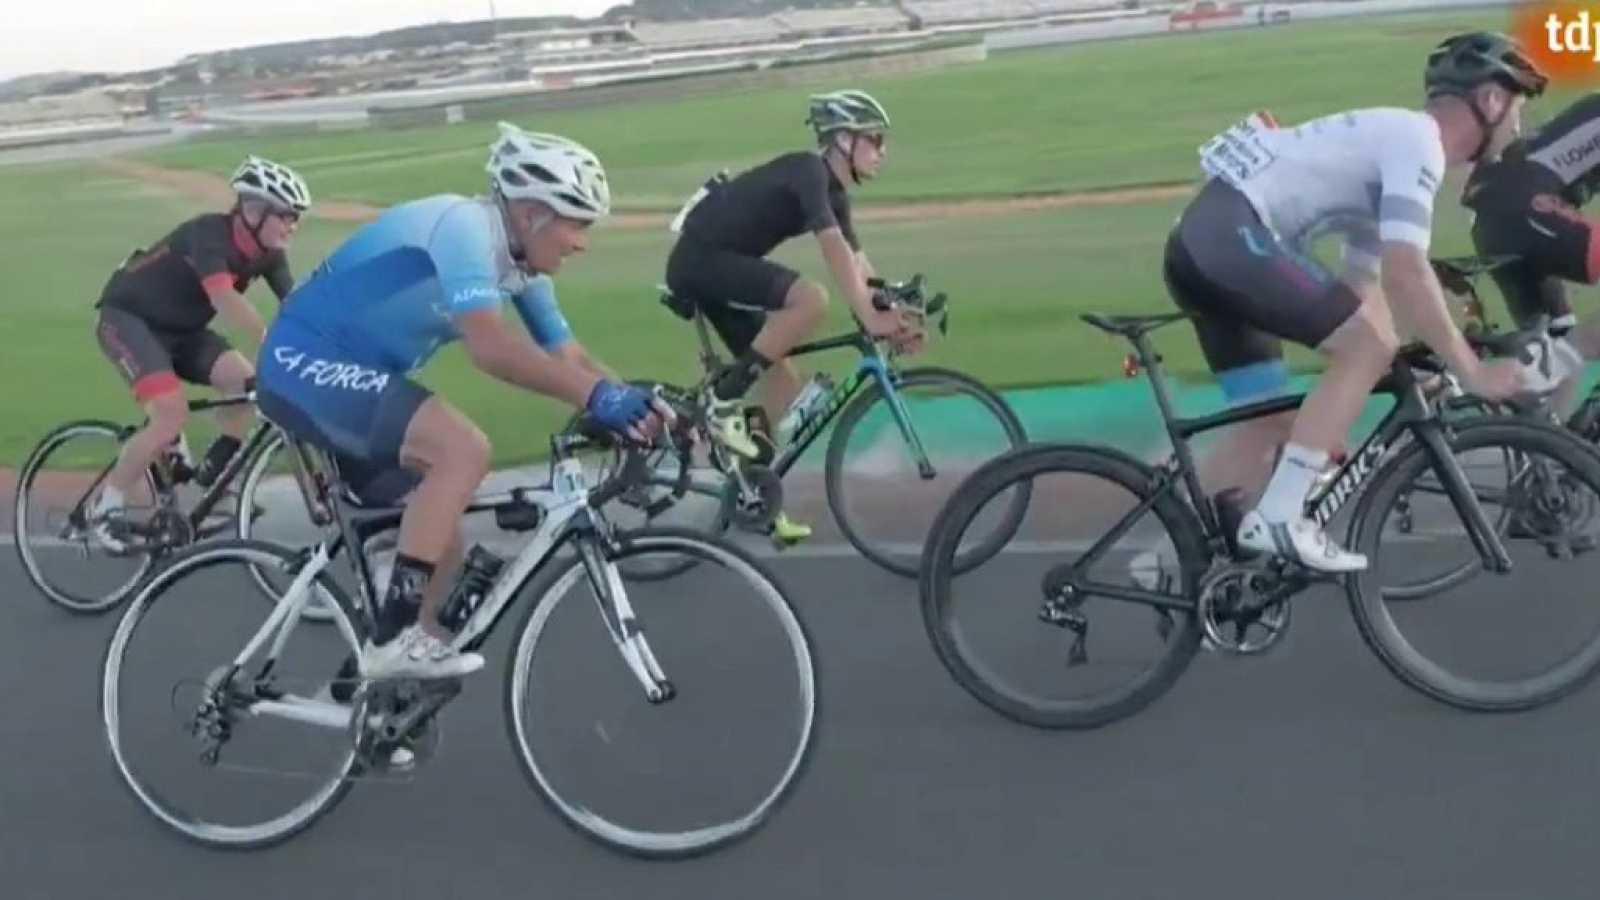 Ciclismo - Campeonato de España. Ultrafondo 24 Horas. Desde Valencia - ver ahora